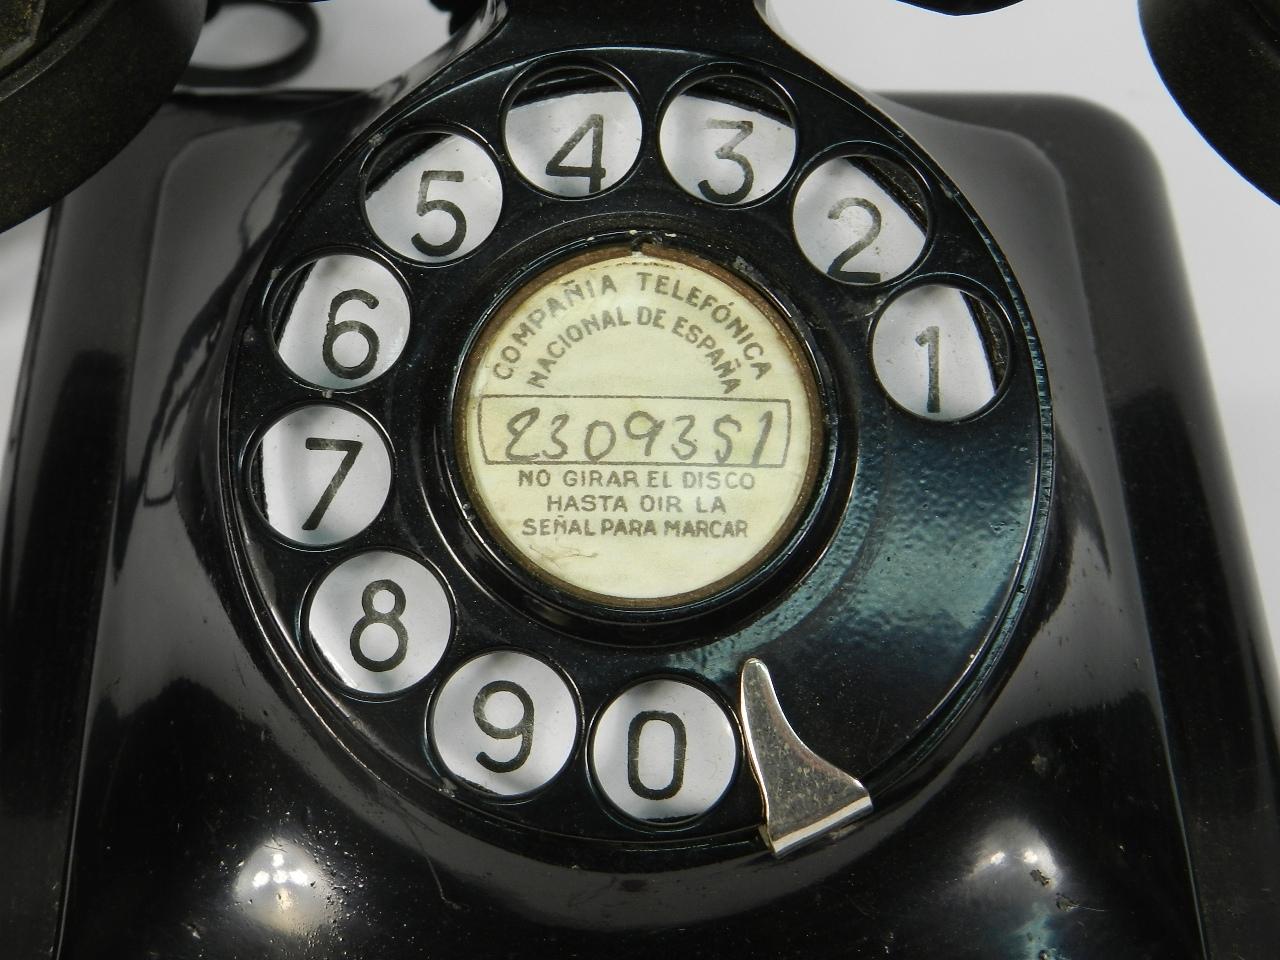 Imagen TELEFONO BELL AÑO 1940 41533